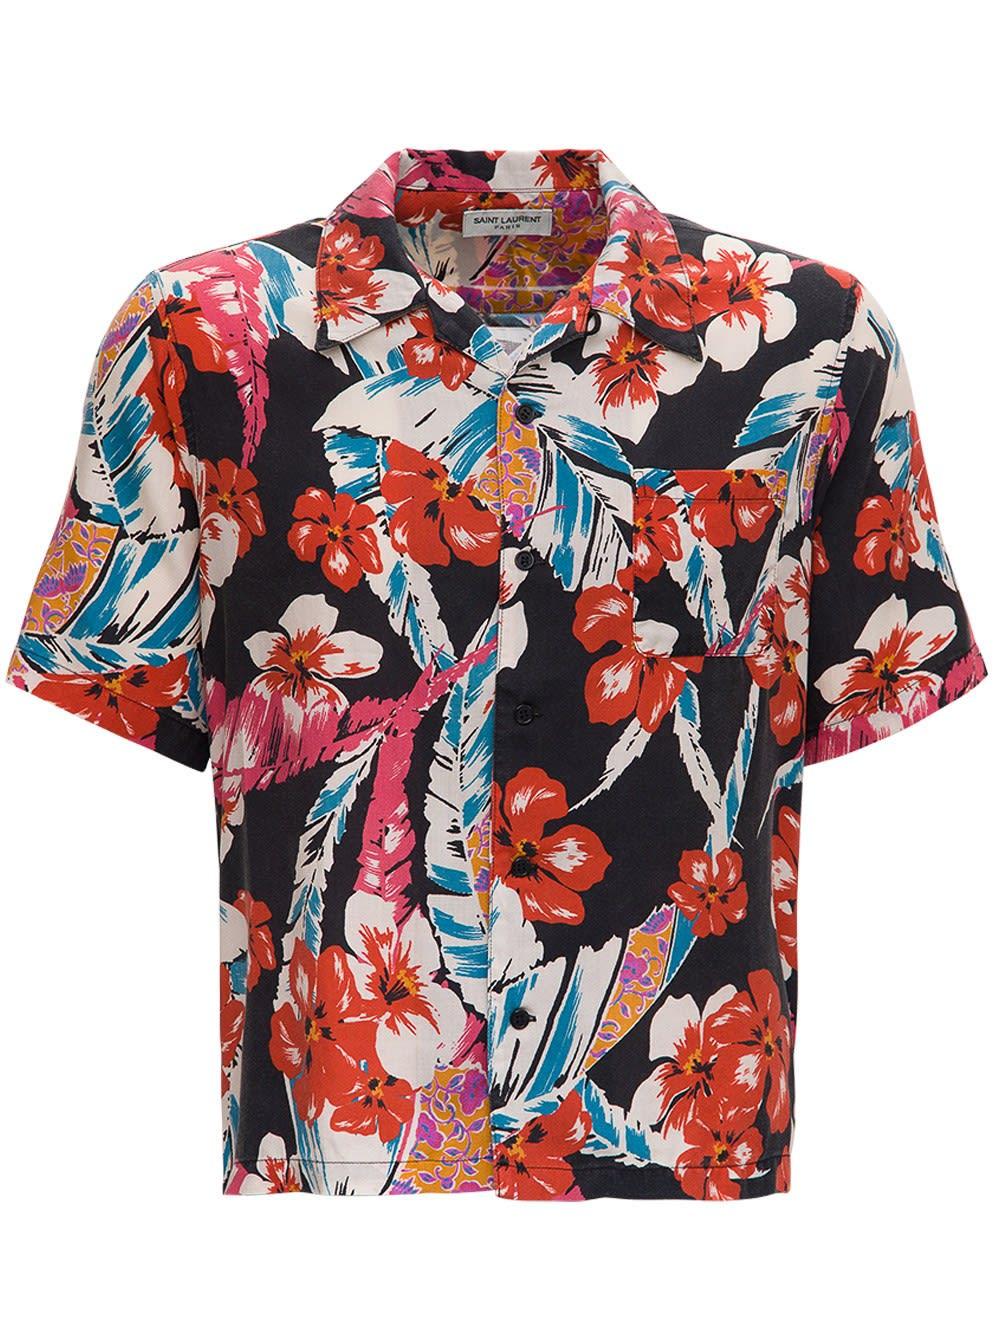 Saint Laurent Clothing LYOCELL MULTICOLOR HAWAIIAN SHIRT